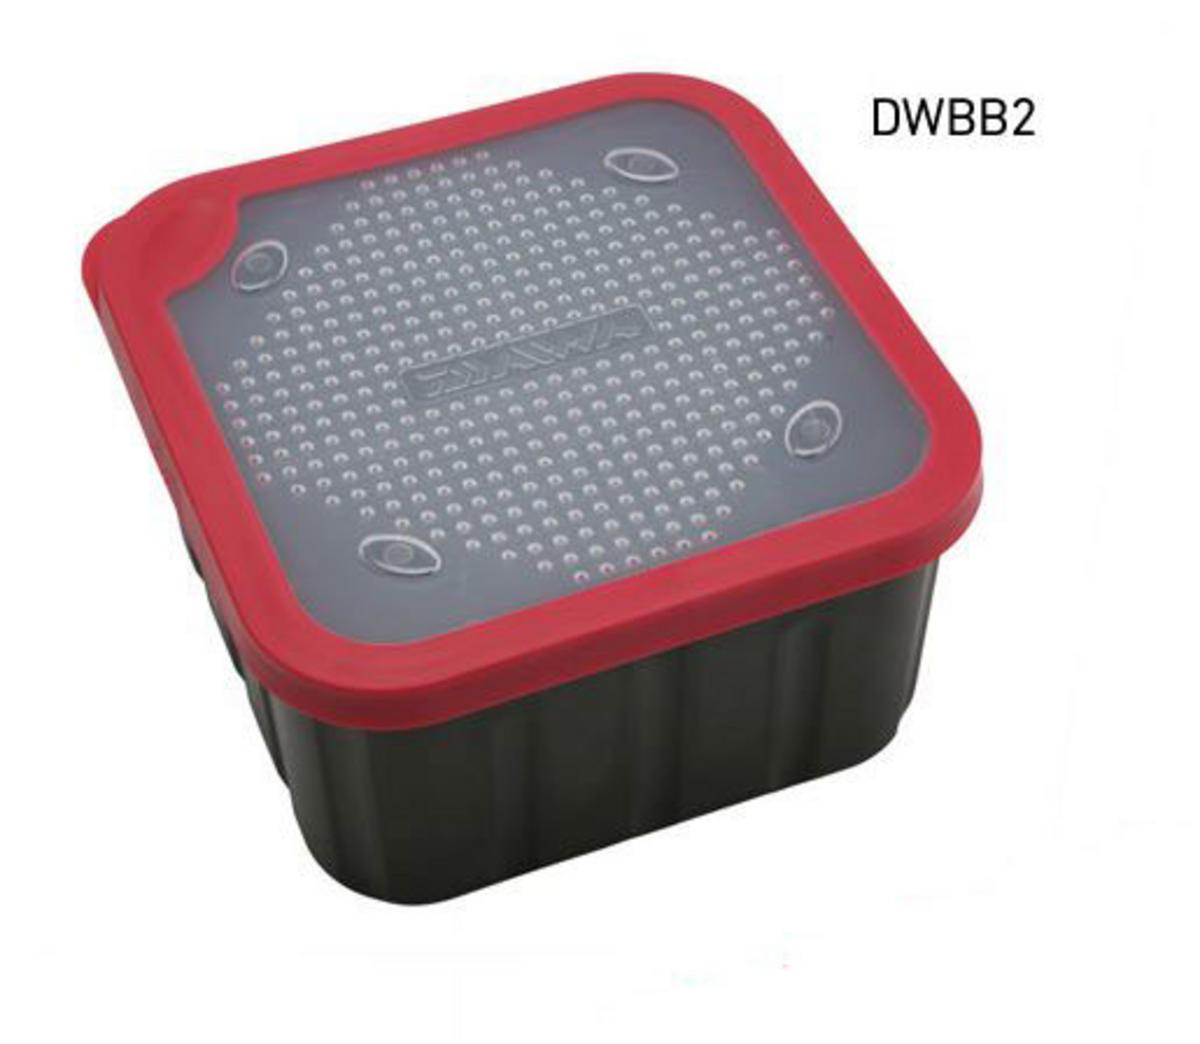 DAIWA DAIWA BAIT BOX 2 LTR Model No DWBB2